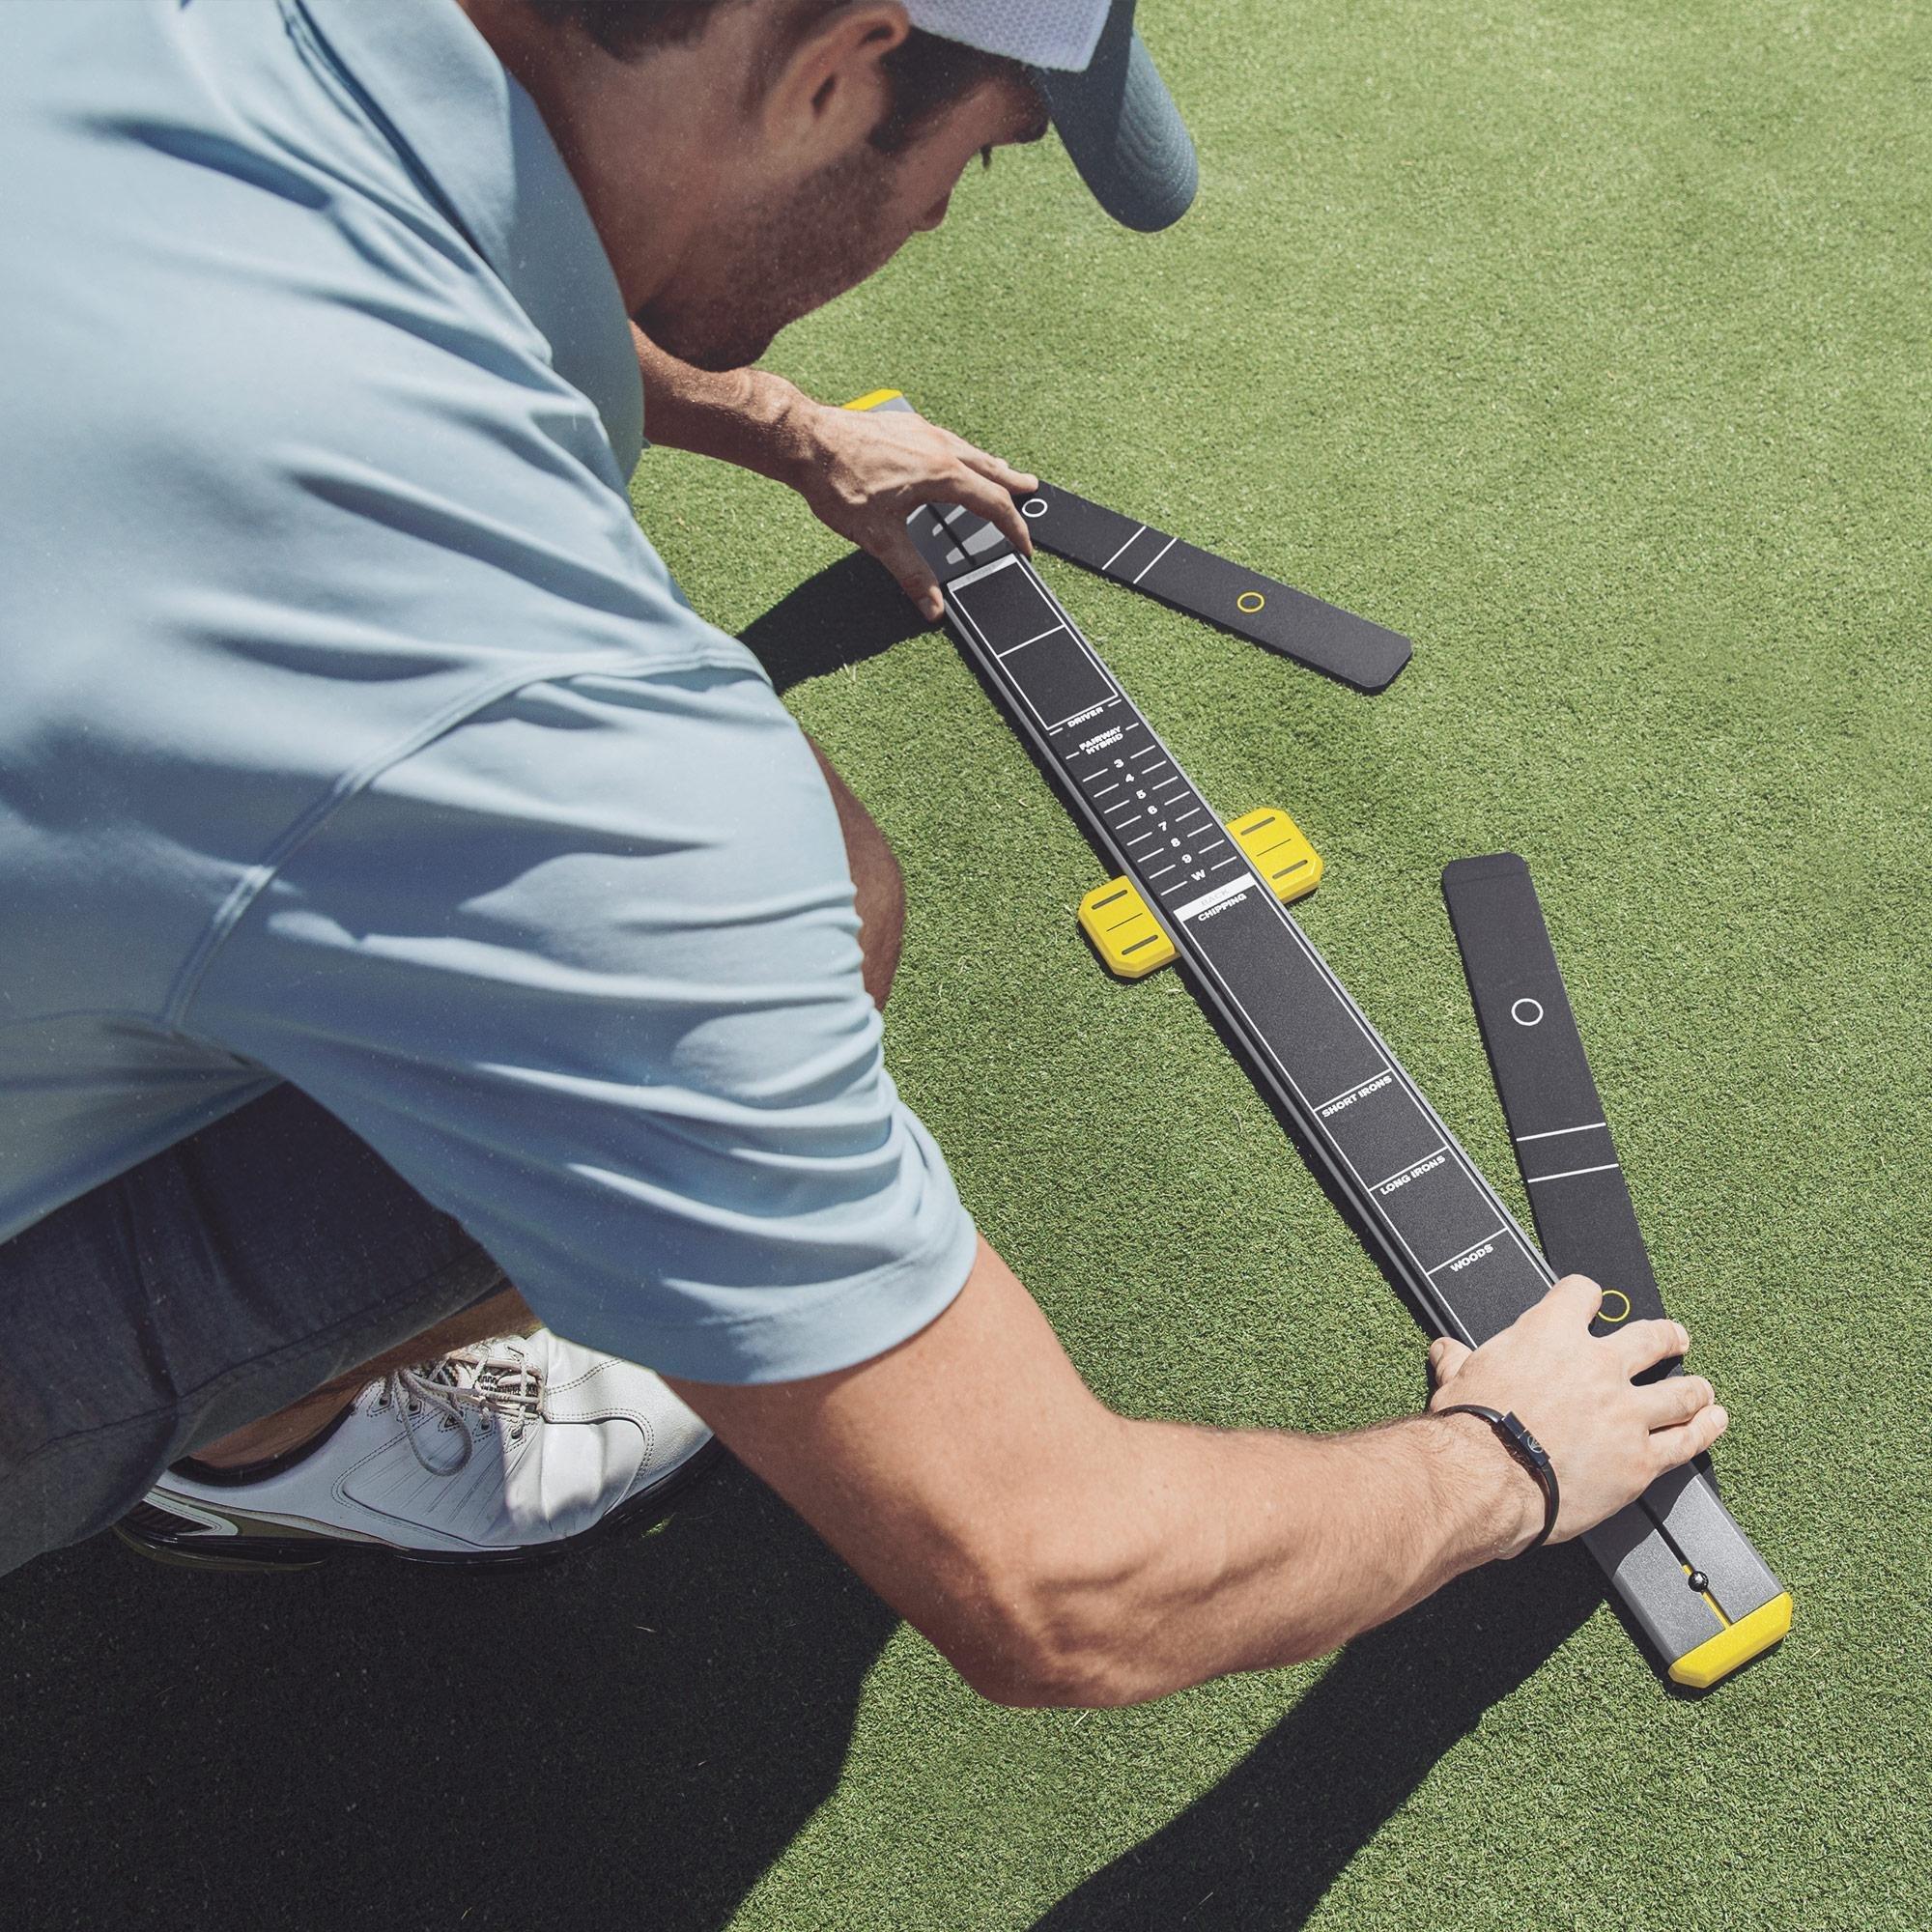 Amazon.com : SKLZ Set-Up Trainer : Sports & Outdoors